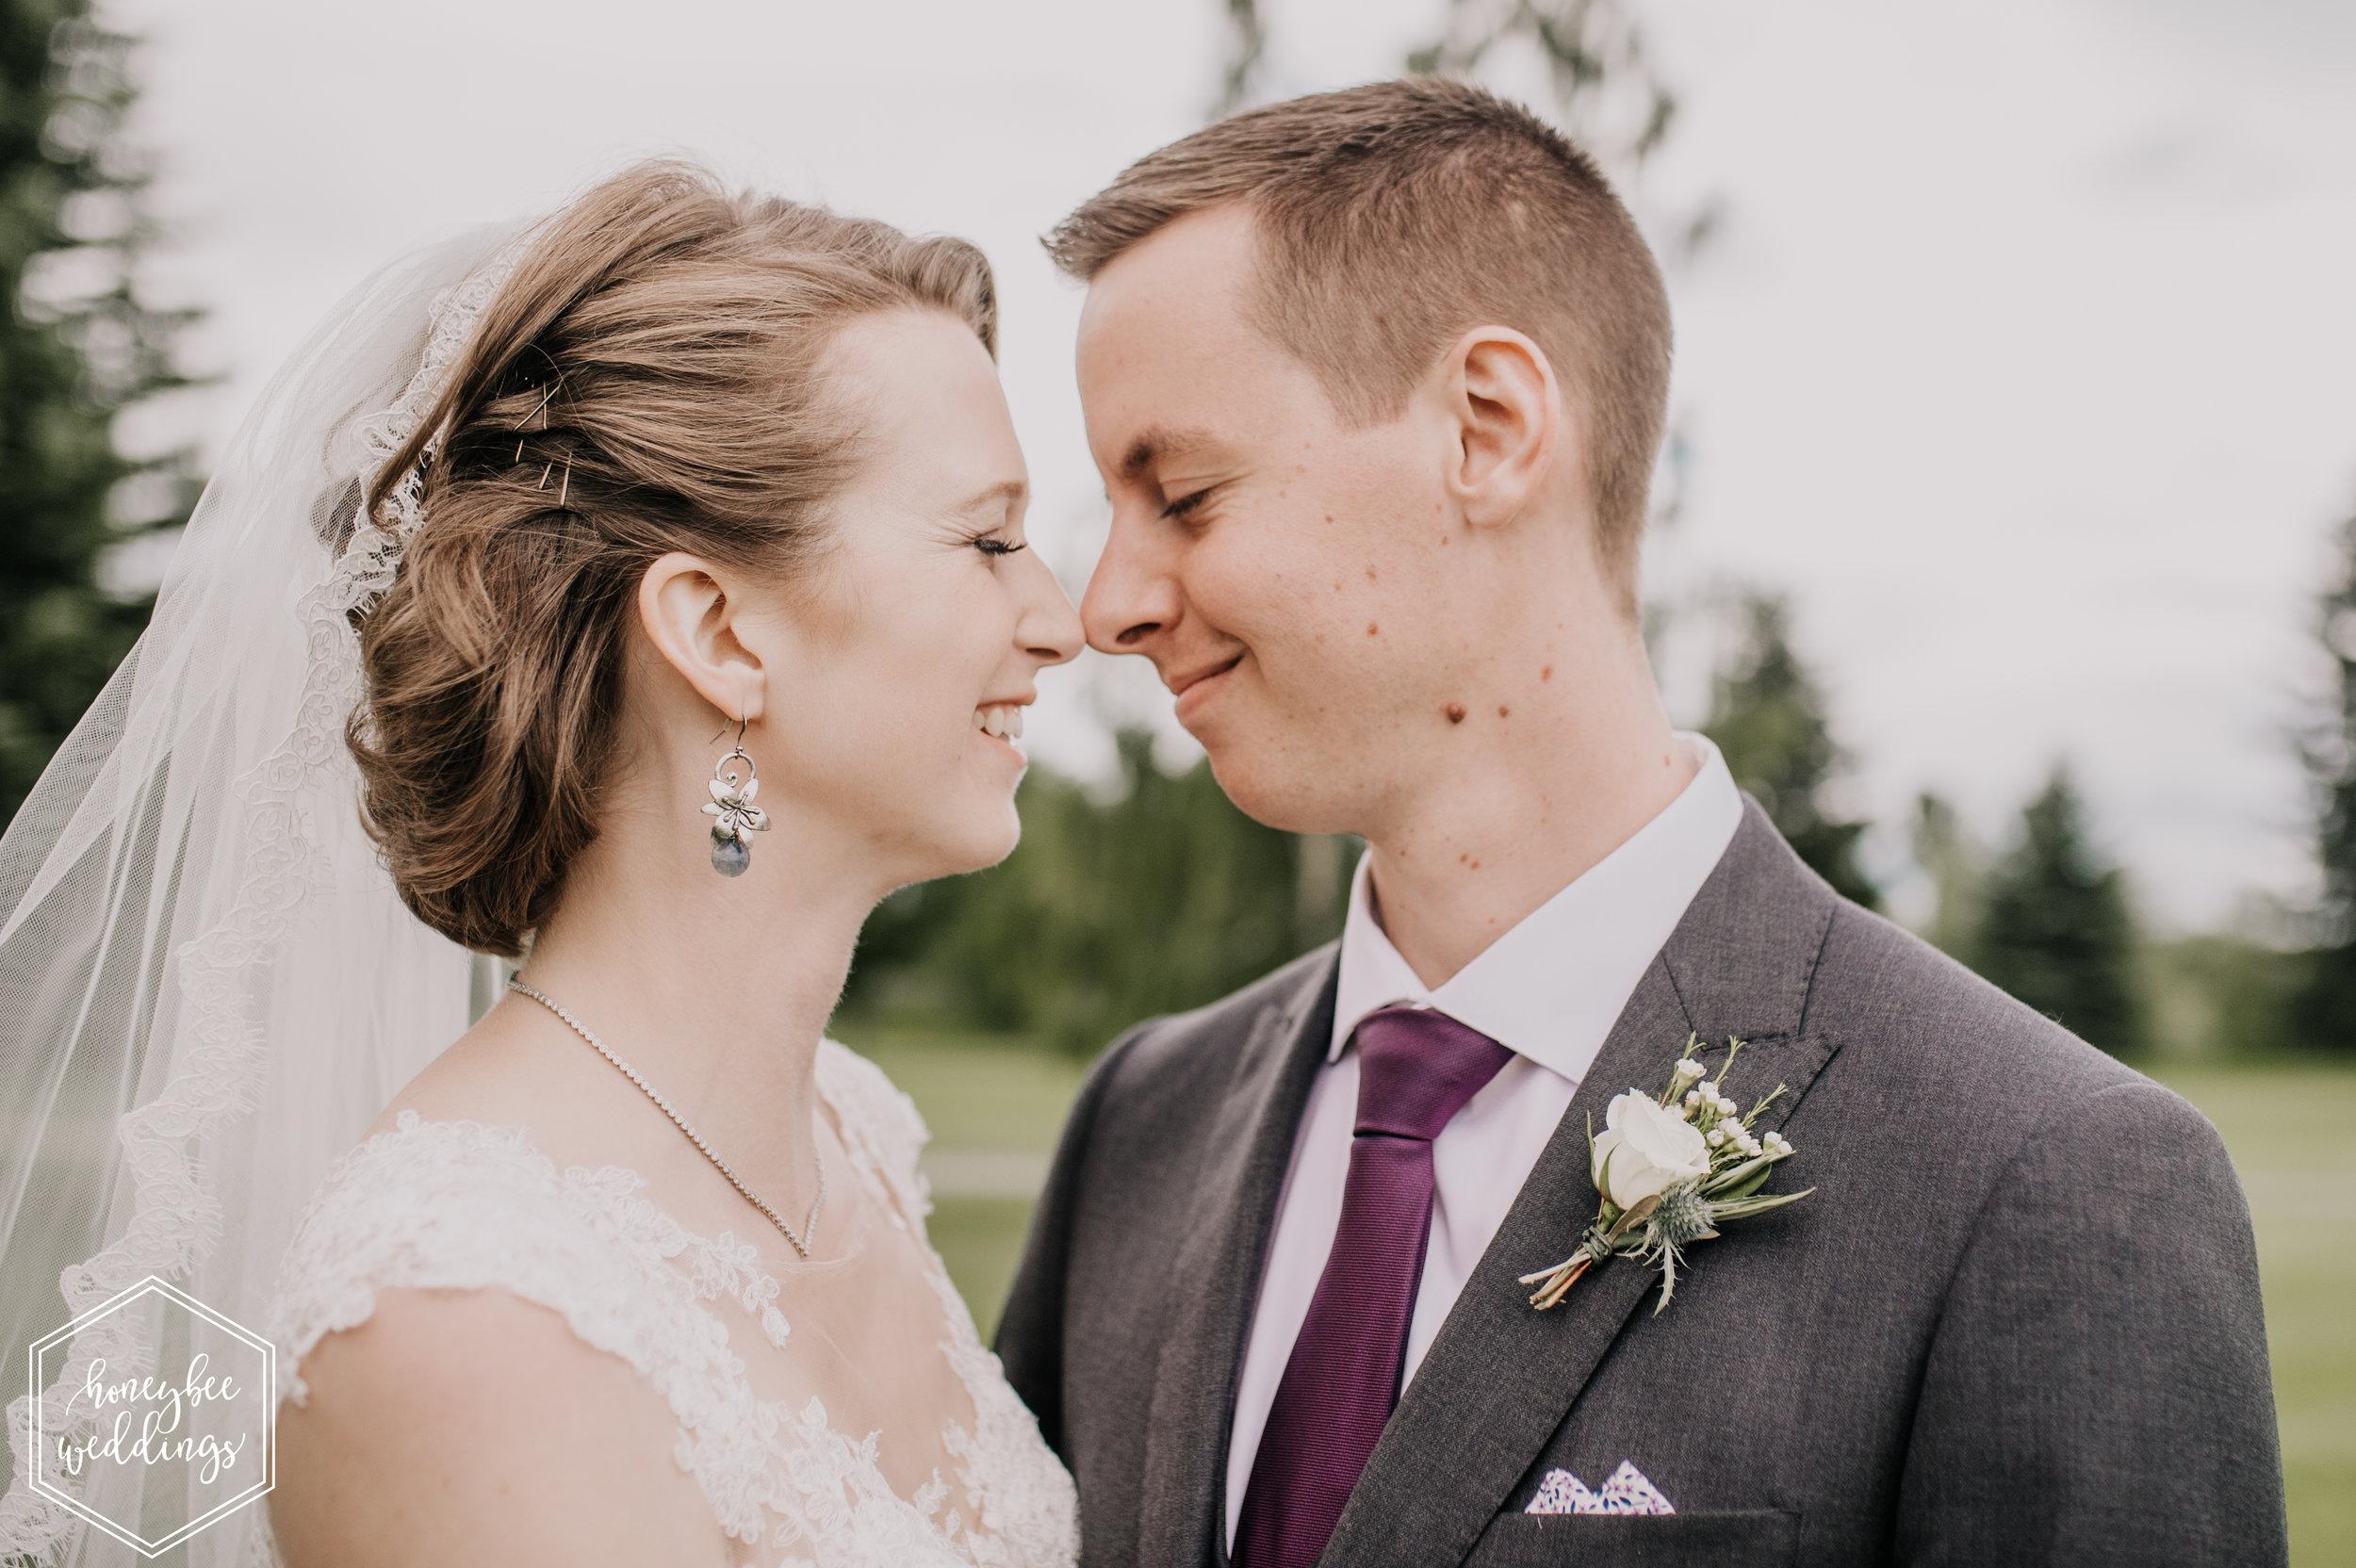 783 Riverside Country Club Wedding_Montana Wedding Photographer_Lauren Jackson + Evan Ivaldi 2018-8313.jpg